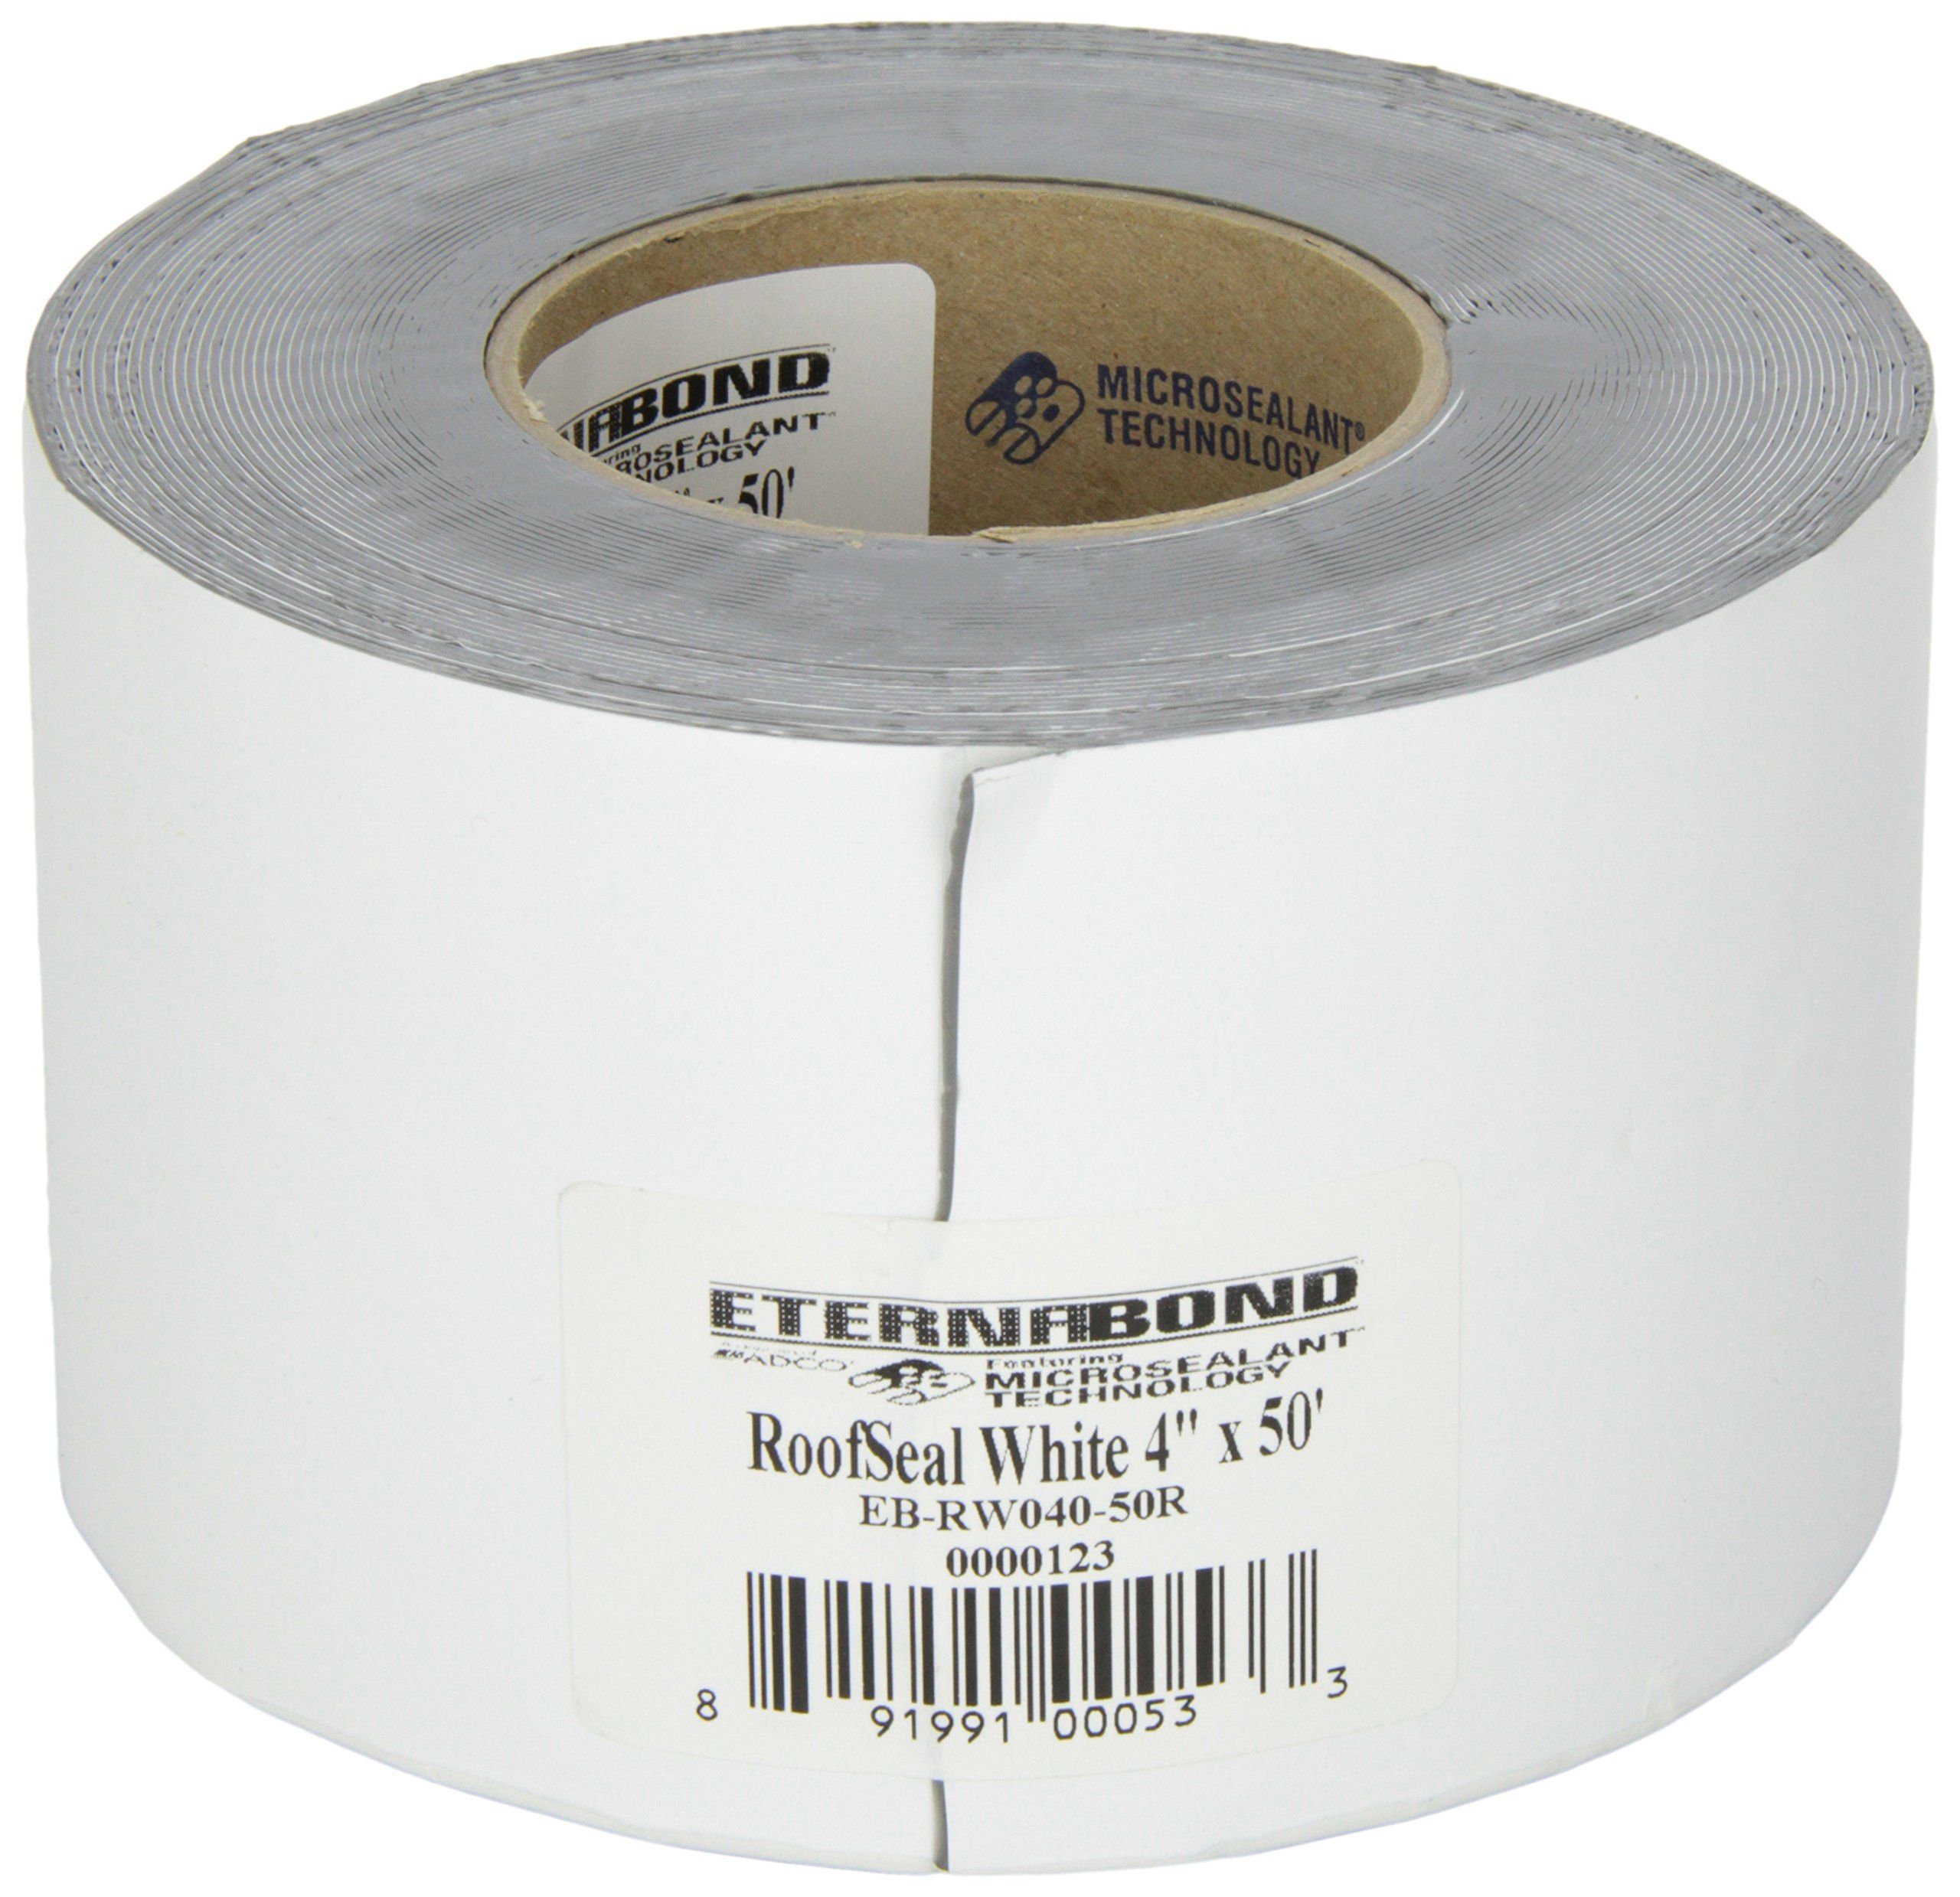 NU-SET RV032-33 White Roof Vent Cap for RV